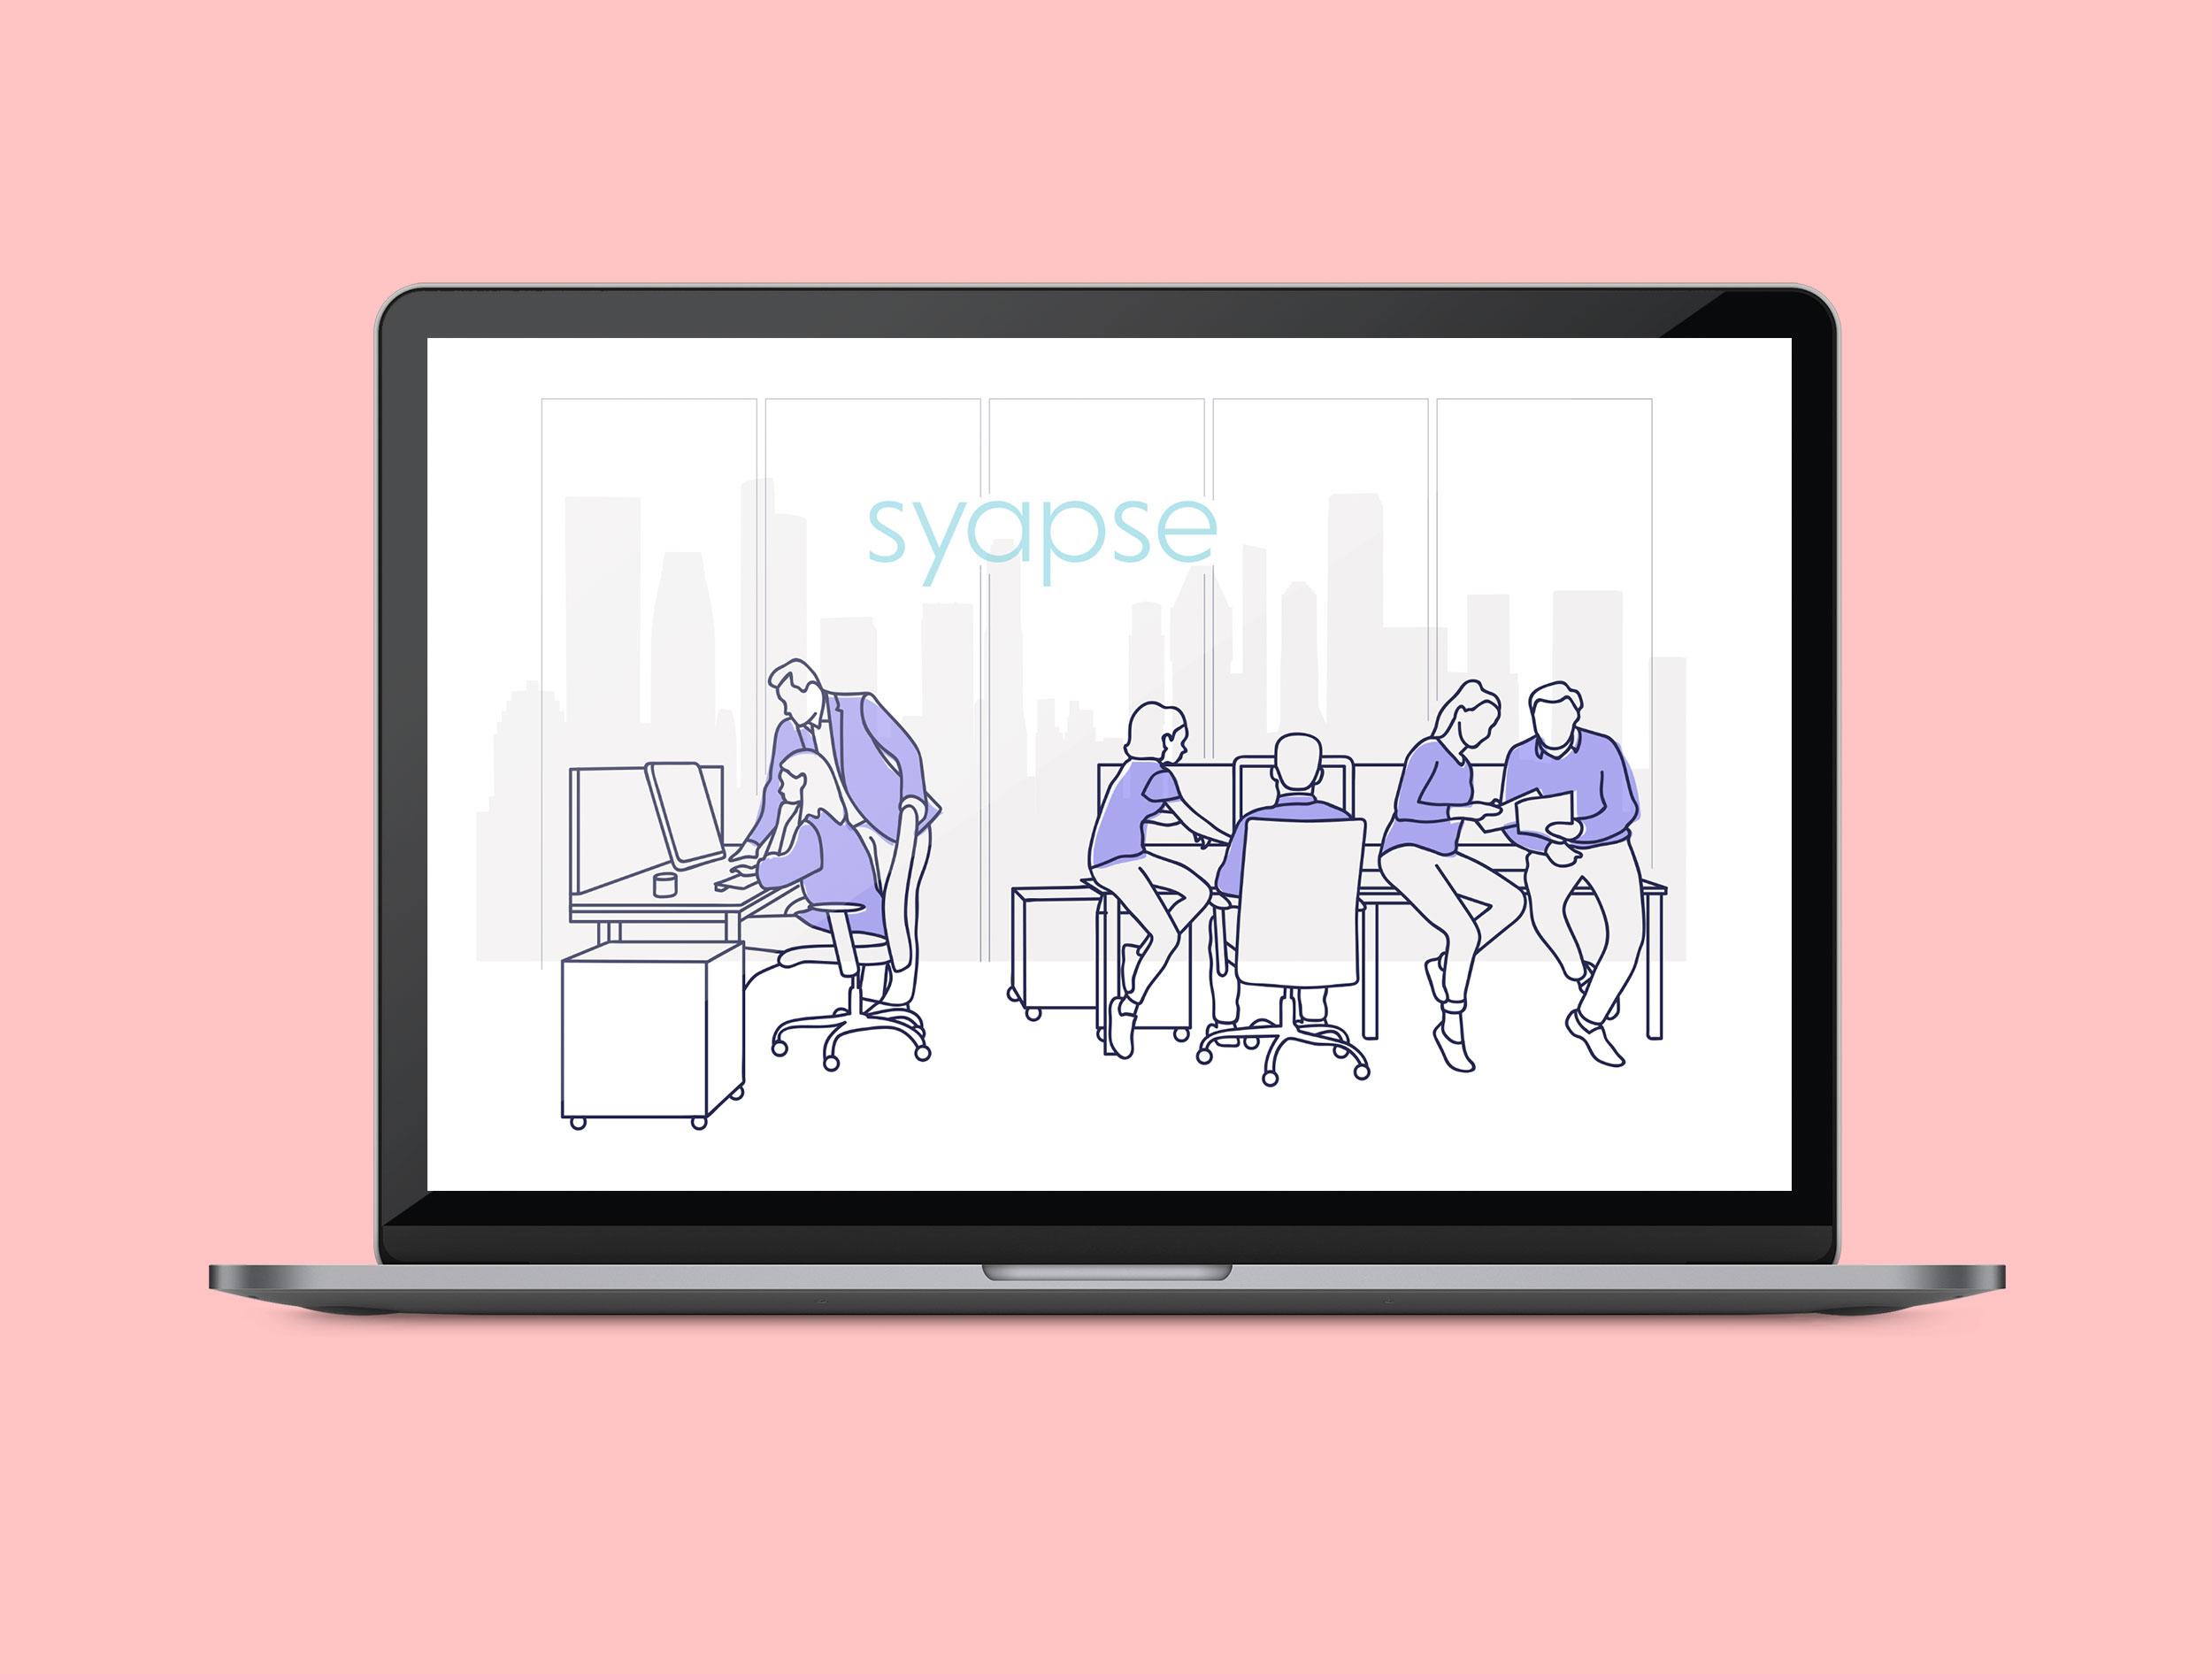 http://www.barryhalldesign.com/wp-content/uploads/2021/01/MacBook_Syapse-Illustrations_1.jpg